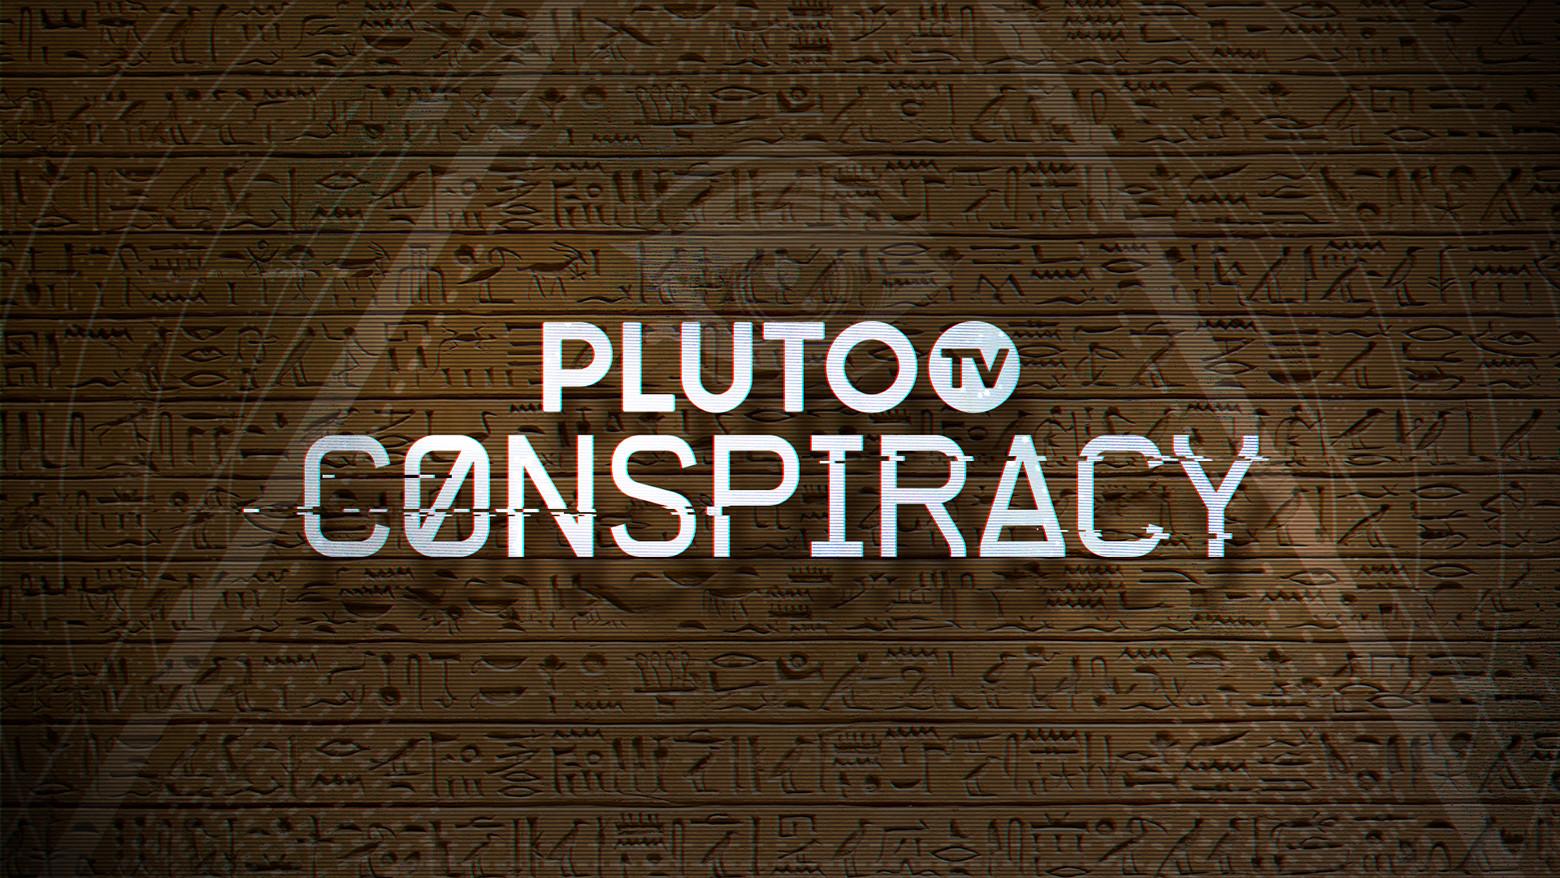 PTV Conspiracy featuredImage.jpg